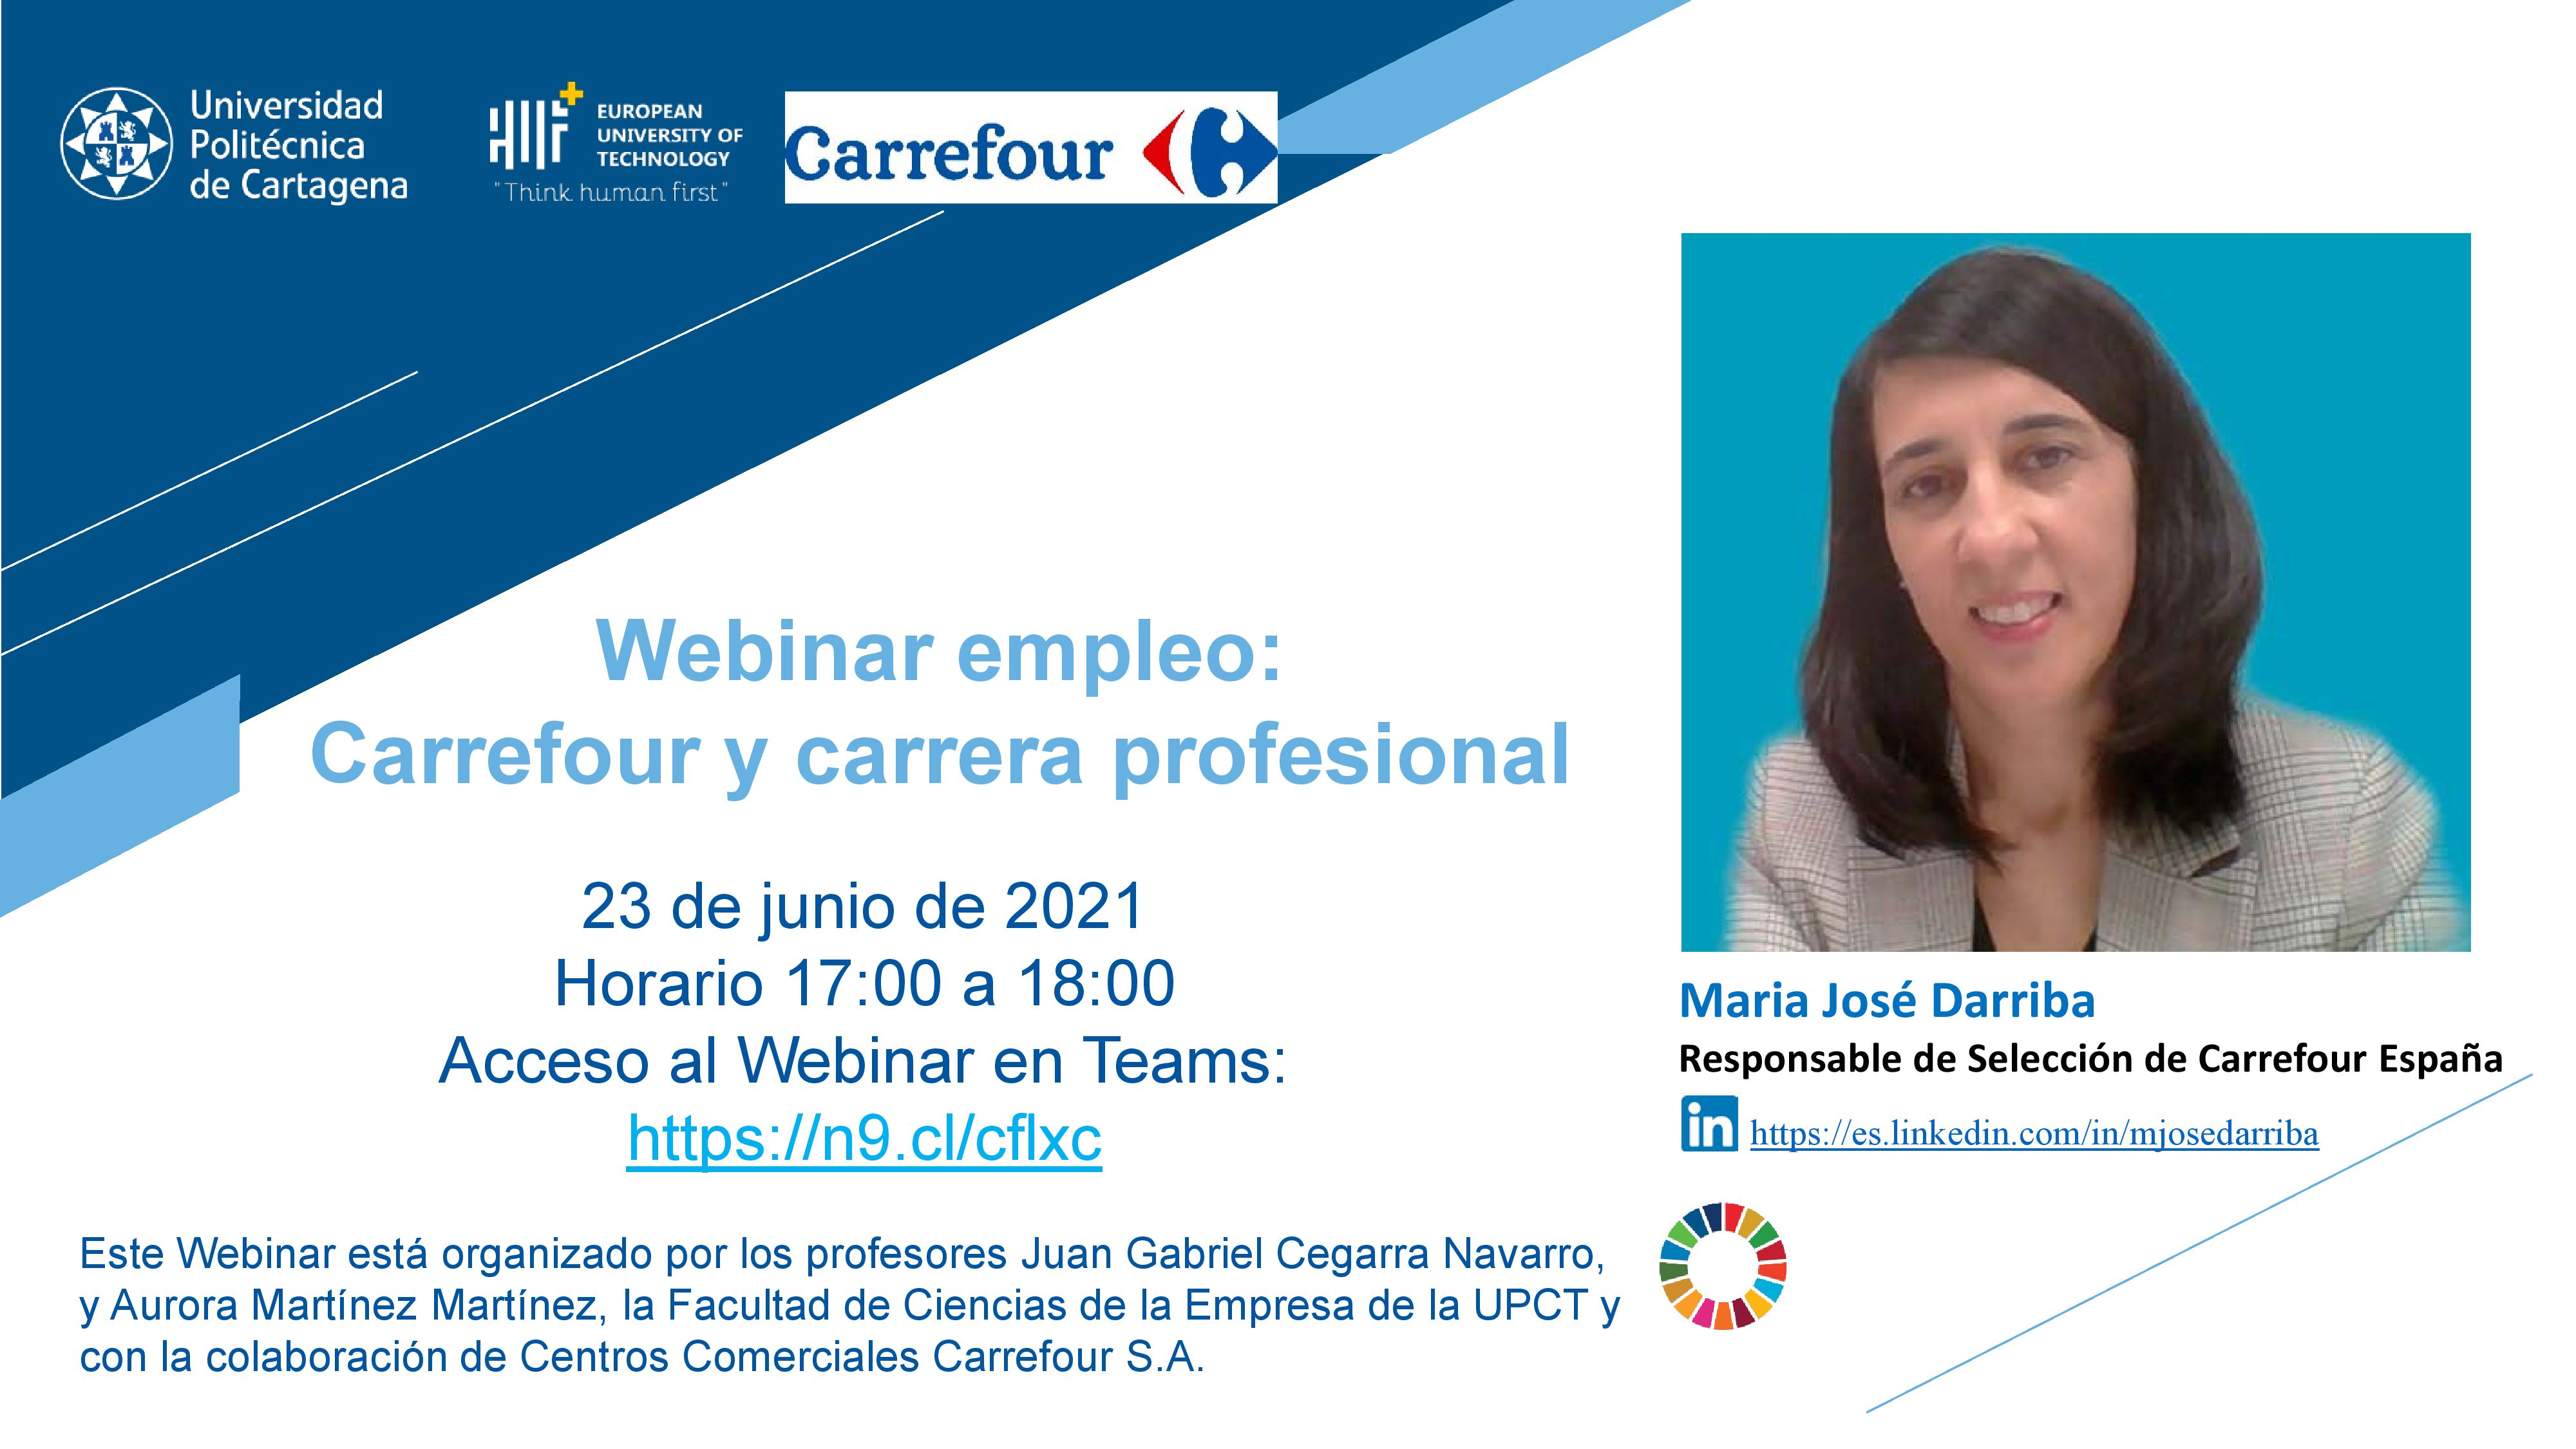 Webinar empleo: Carrefour y carrera profesional